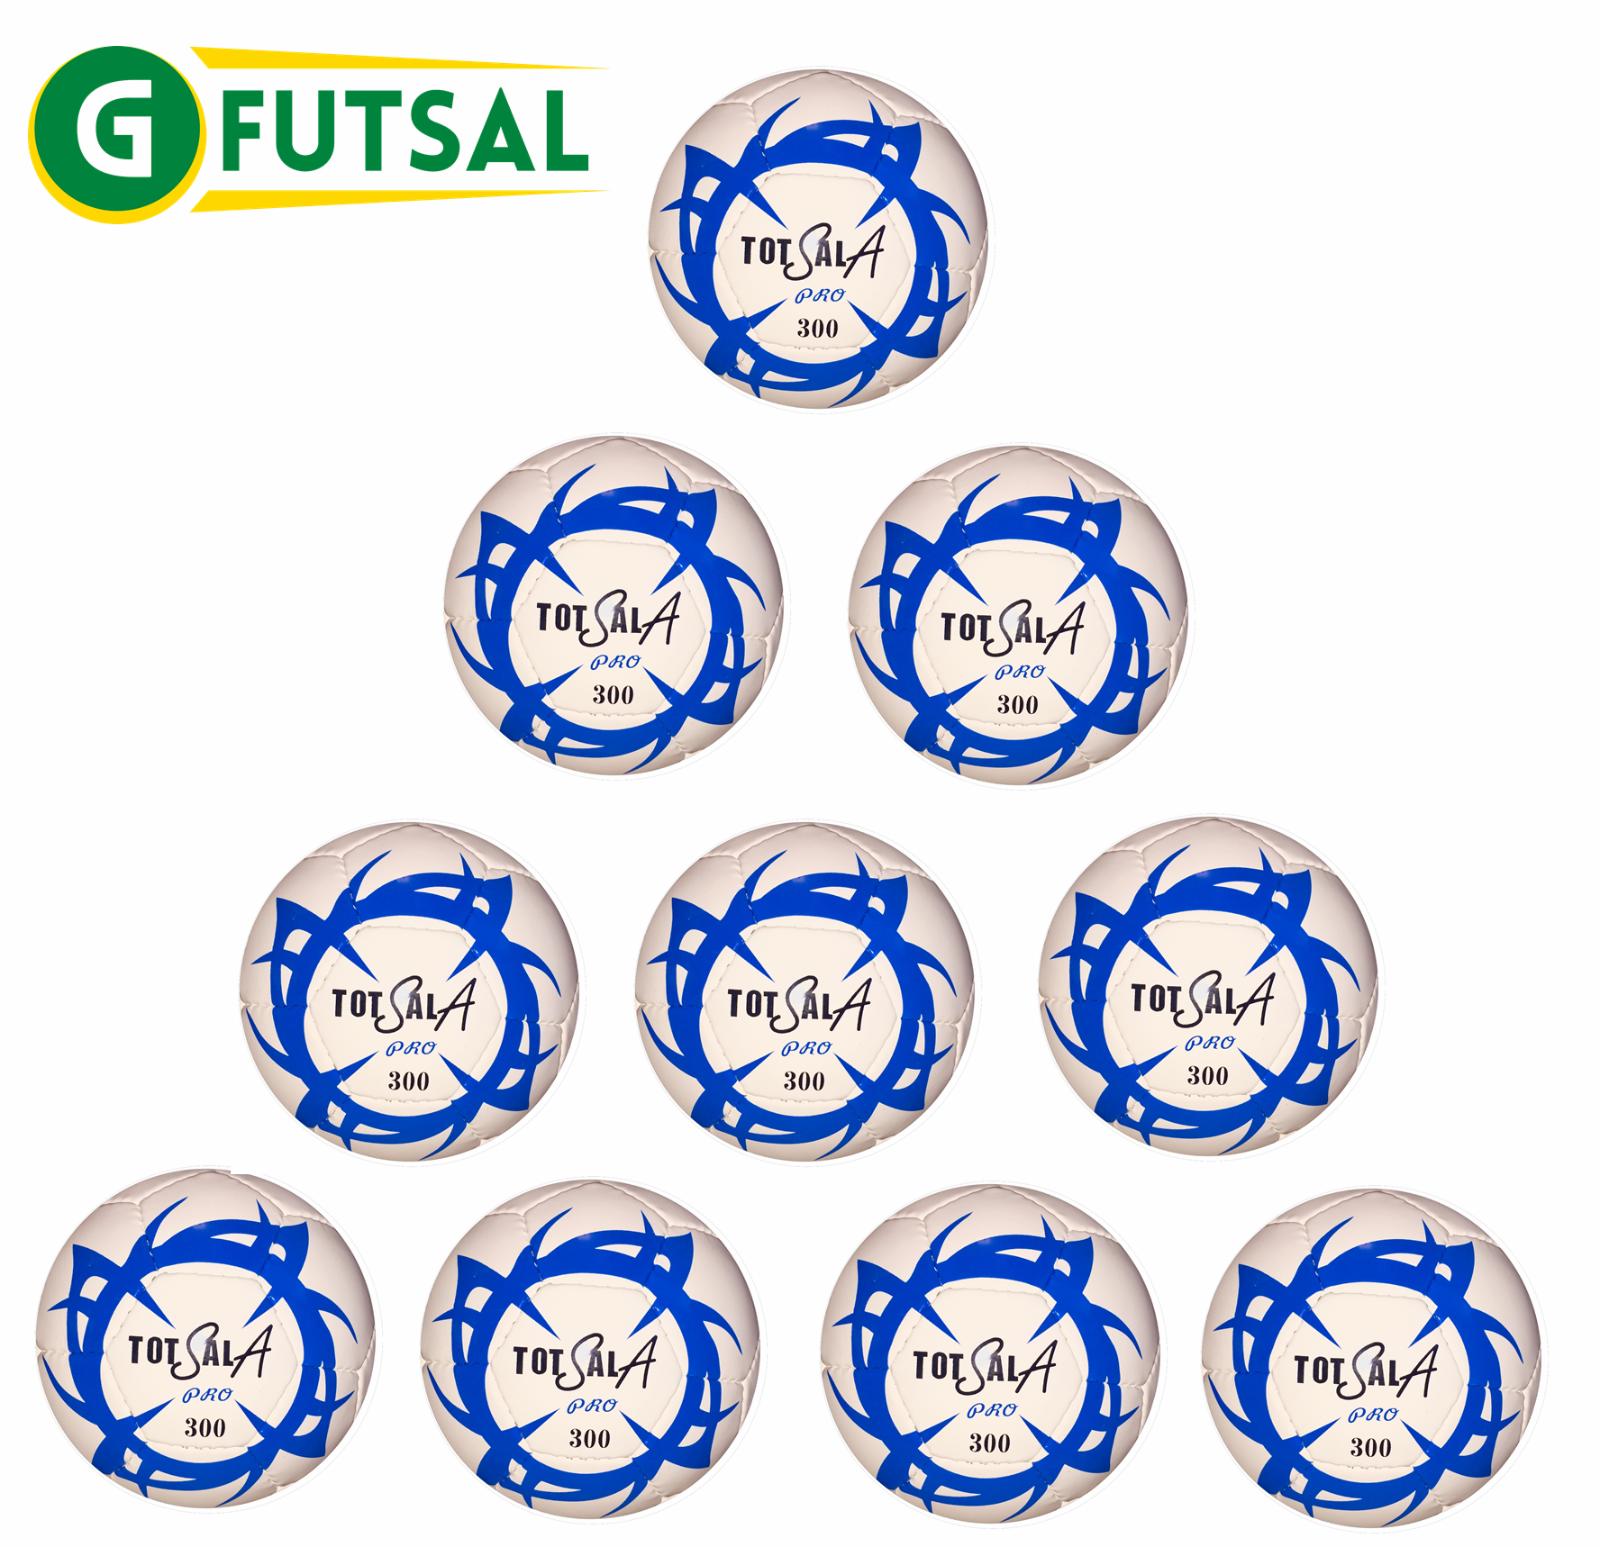 10 x gfutsal totalsala 300 Pro-Futsal Match Ball-Taglia 3